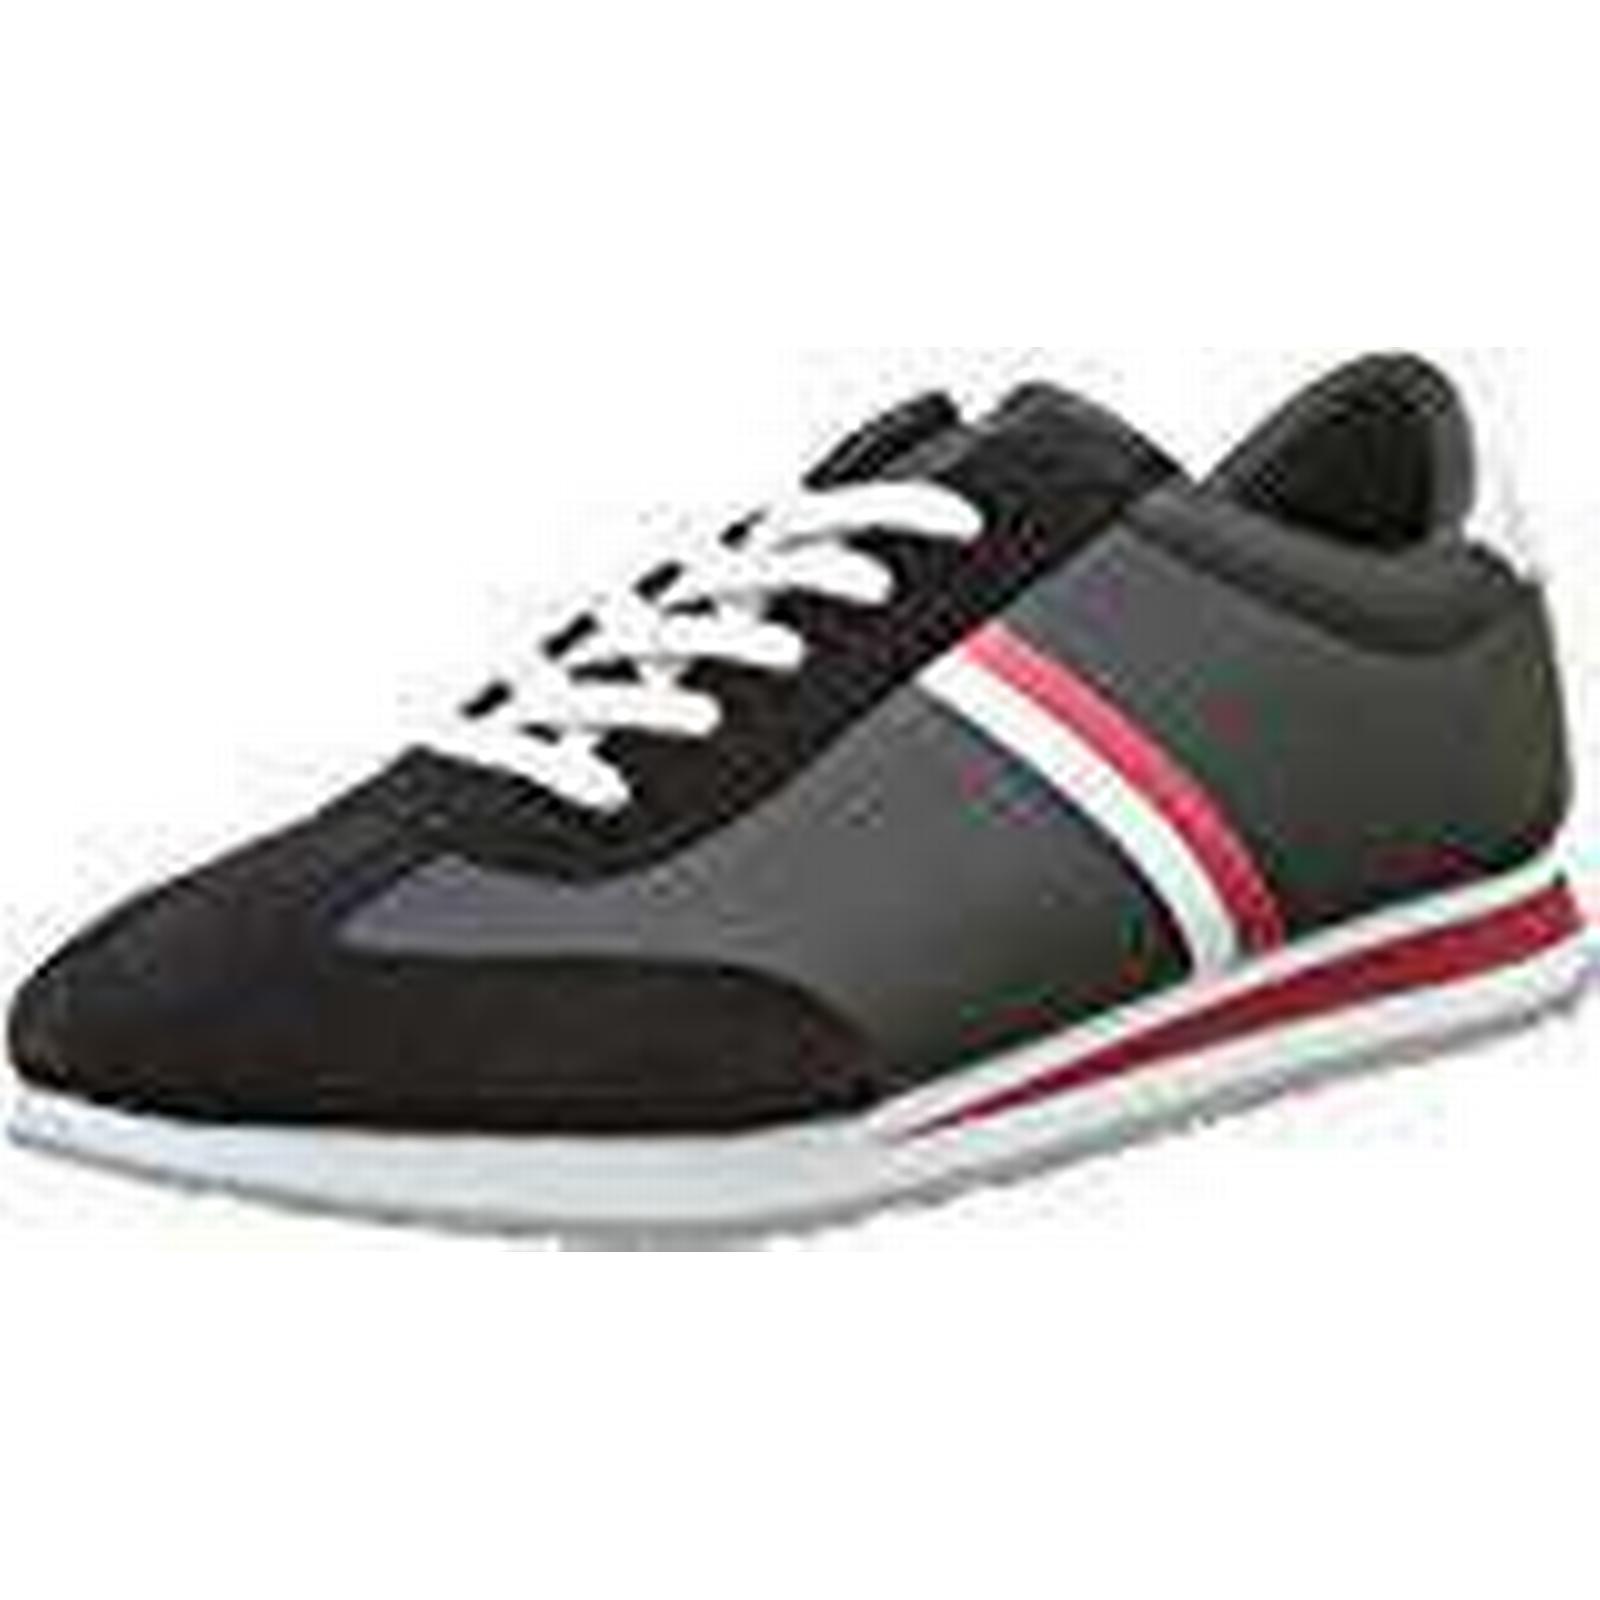 Tommy Hilfiger Men's Core Corporate 403), Sneaker Low-Top, Blue (Midnight 403), Corporate 8 UK 8 UK 2d7e4a